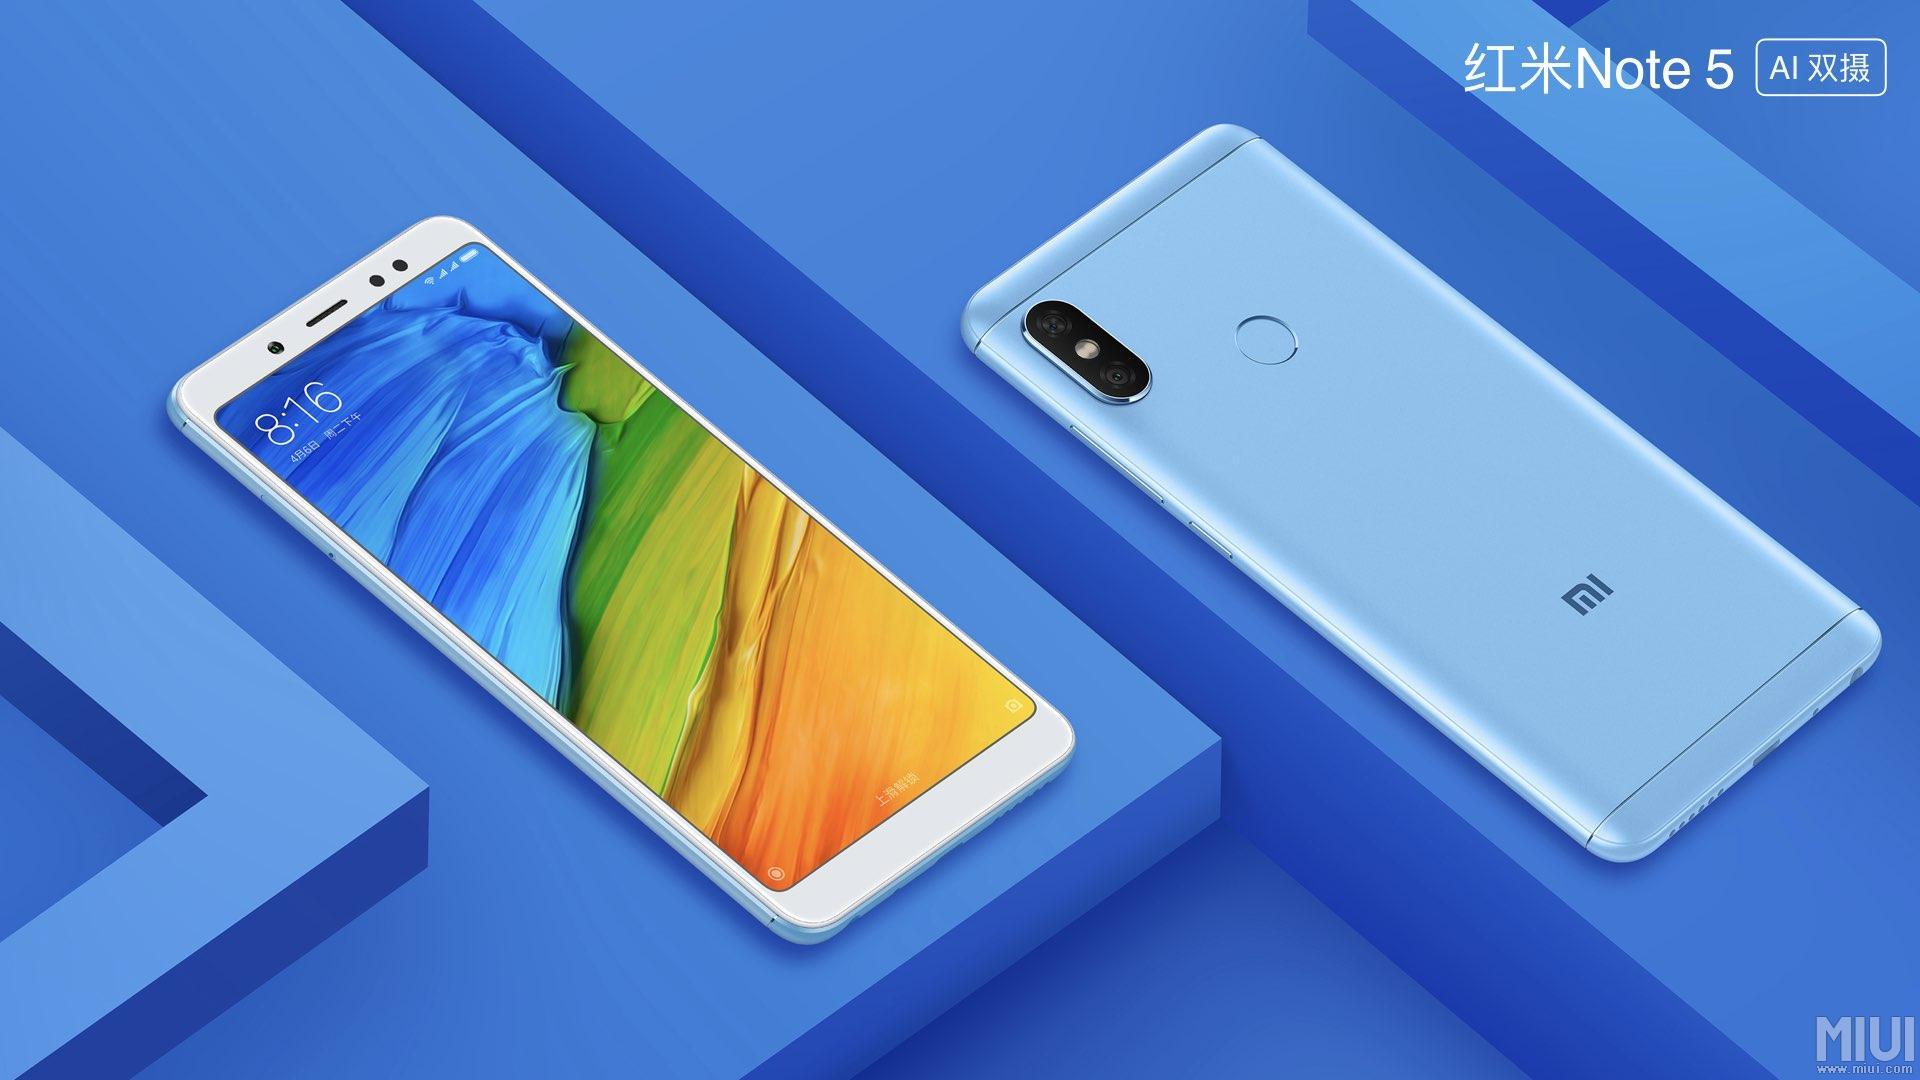 Novinka Xiaomi Redmi Note 5 (AI Dual Camera)